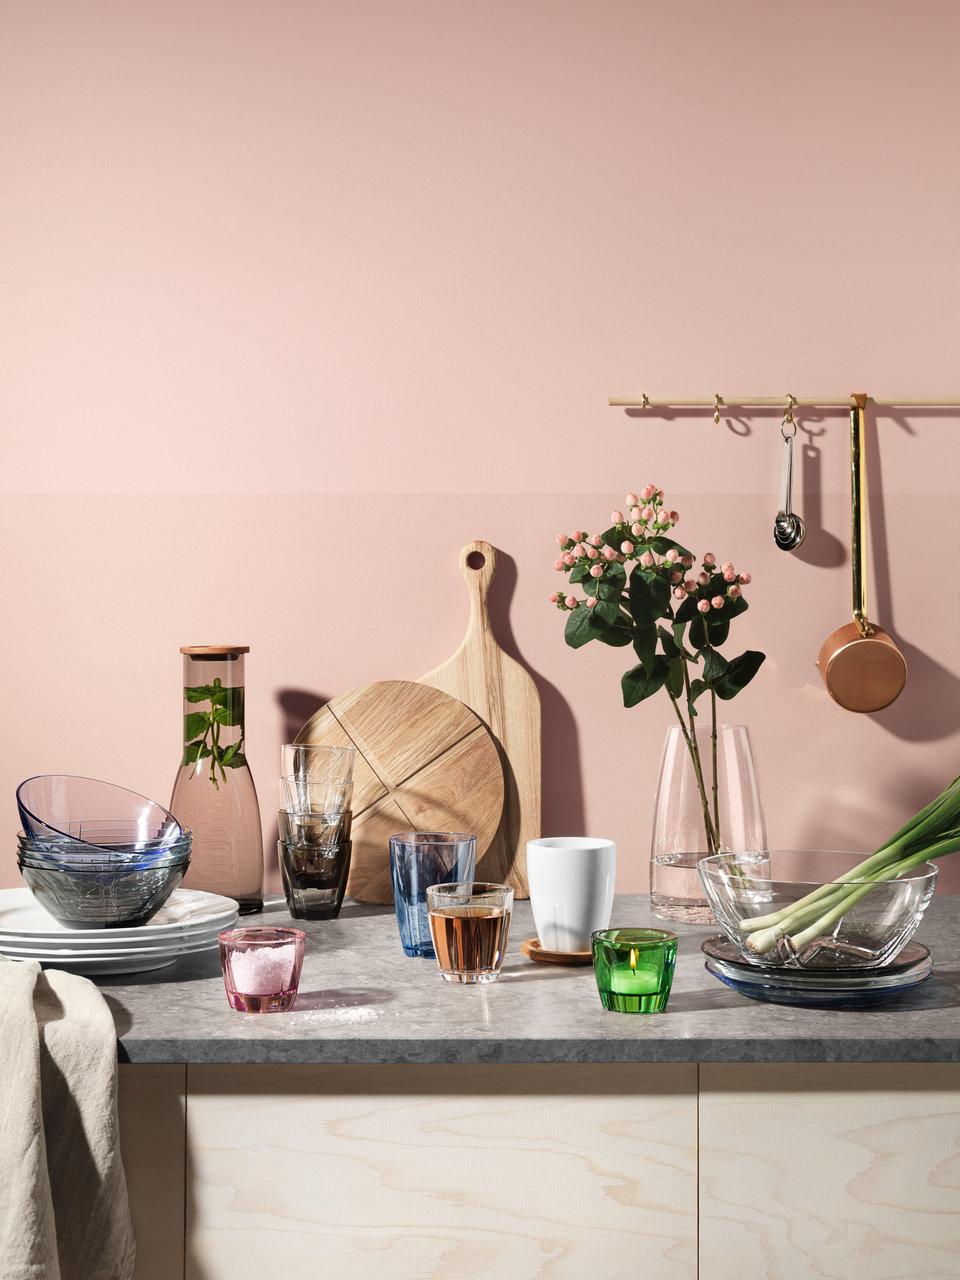 bruk_new-kitchen-tumbler-votive-carafe-vase-bowl-plate_img_36361768021_o.jpg